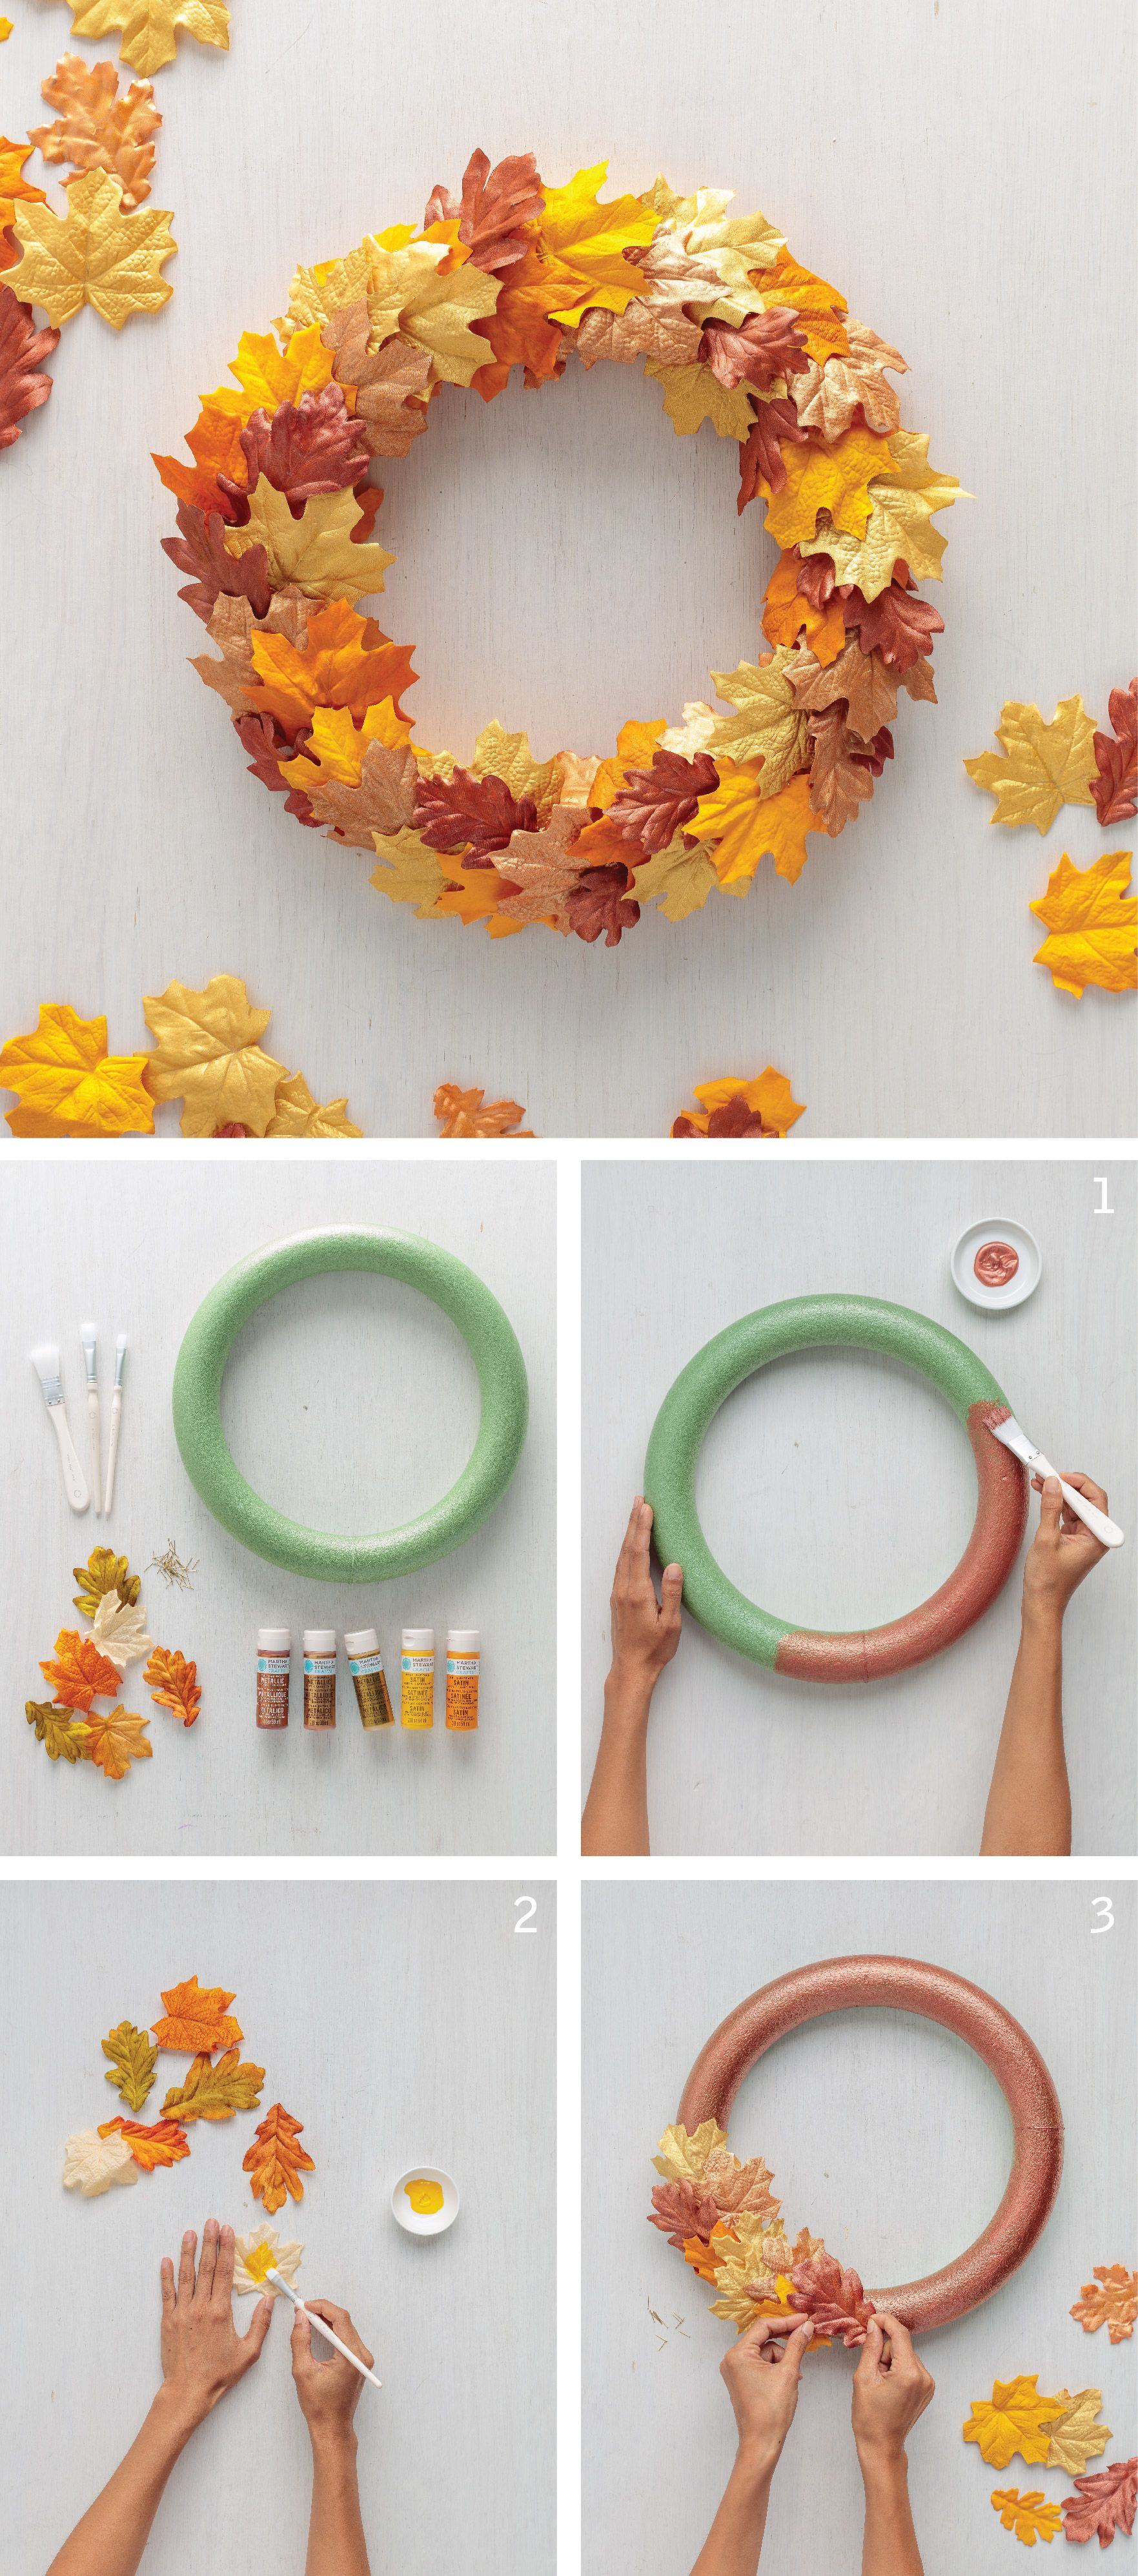 Painted Fall Leaf Wreath Wreaths Martha Stewart Crafts Thanksgiving